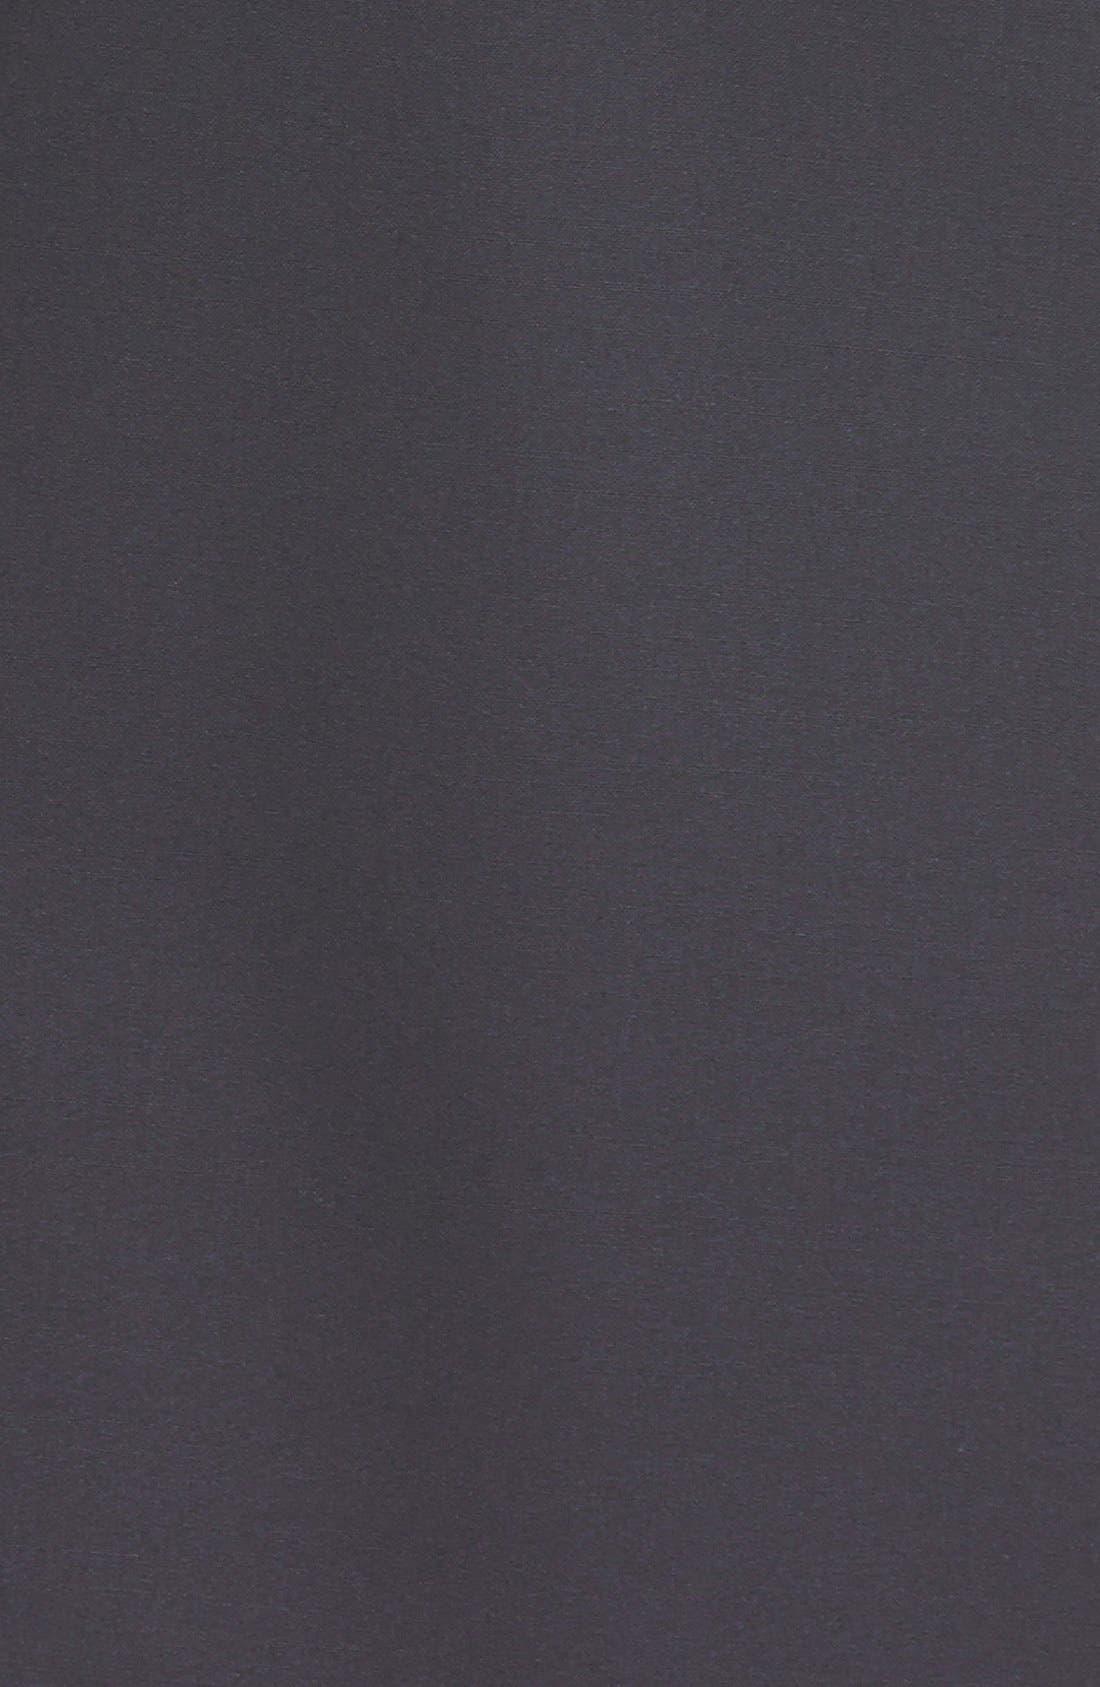 Vilea Tropical Stretch Wool Pencil Skirt,                             Alternate thumbnail 16, color,